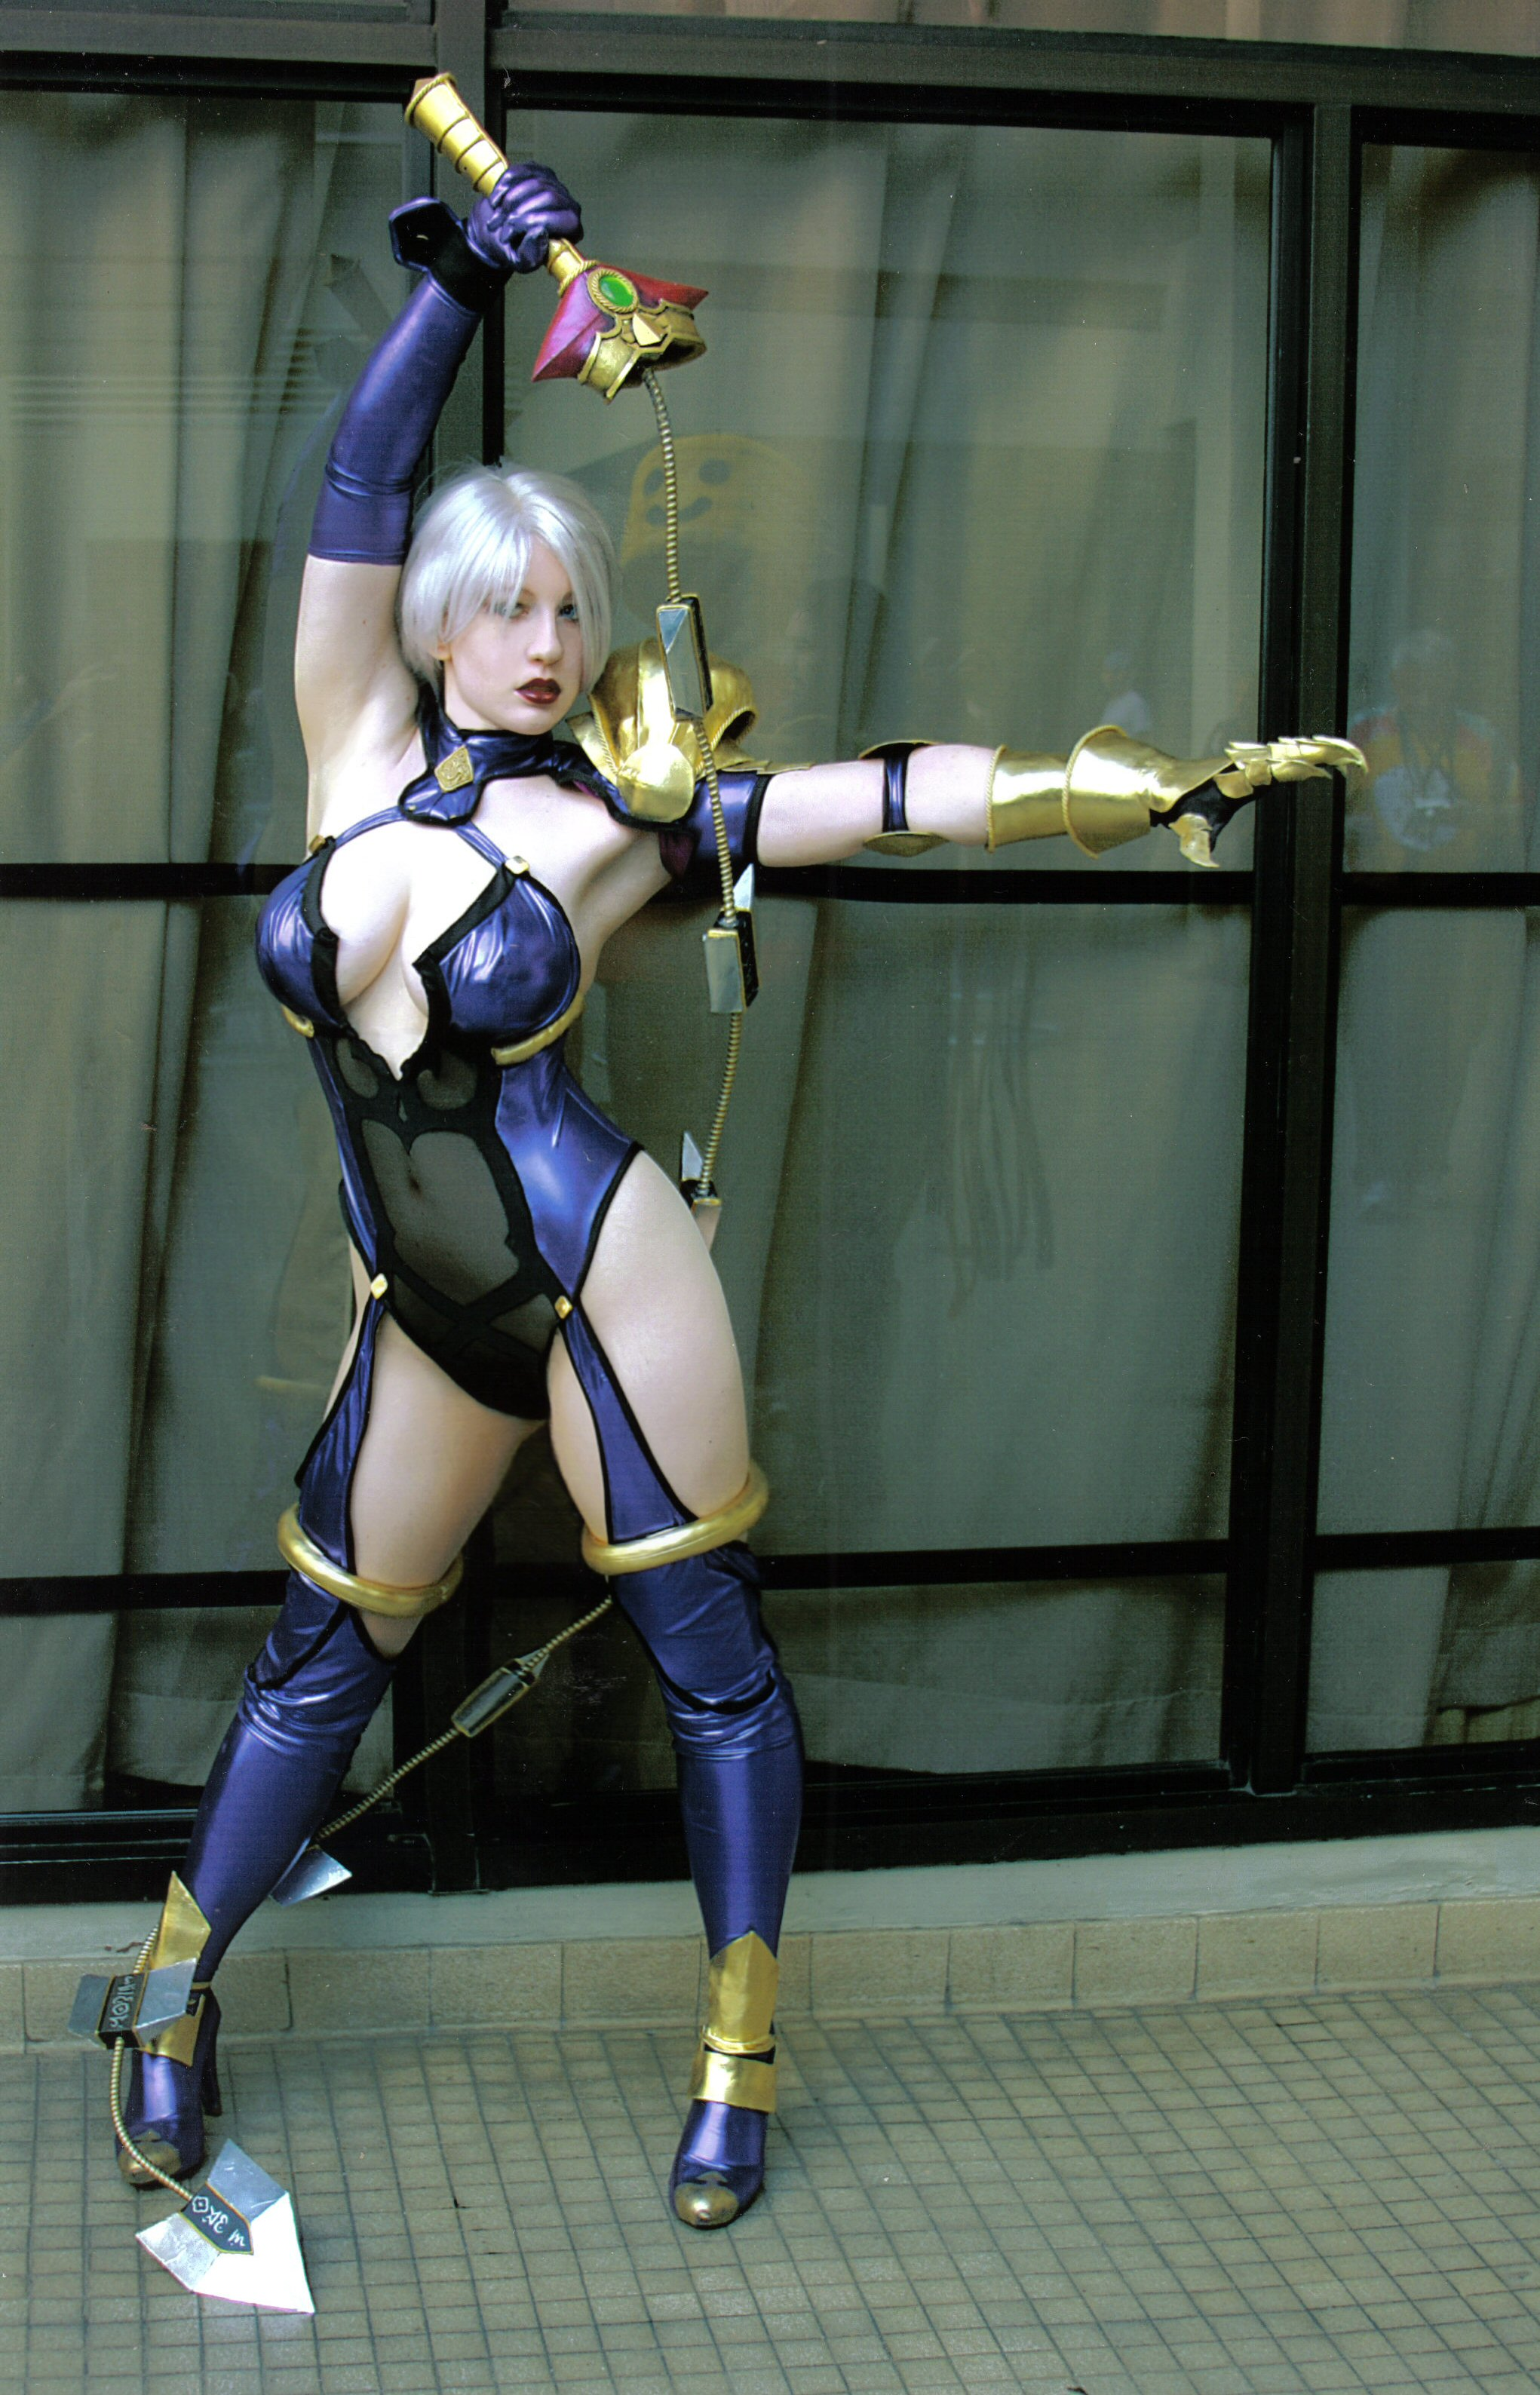 Makoto street fighter cosplay